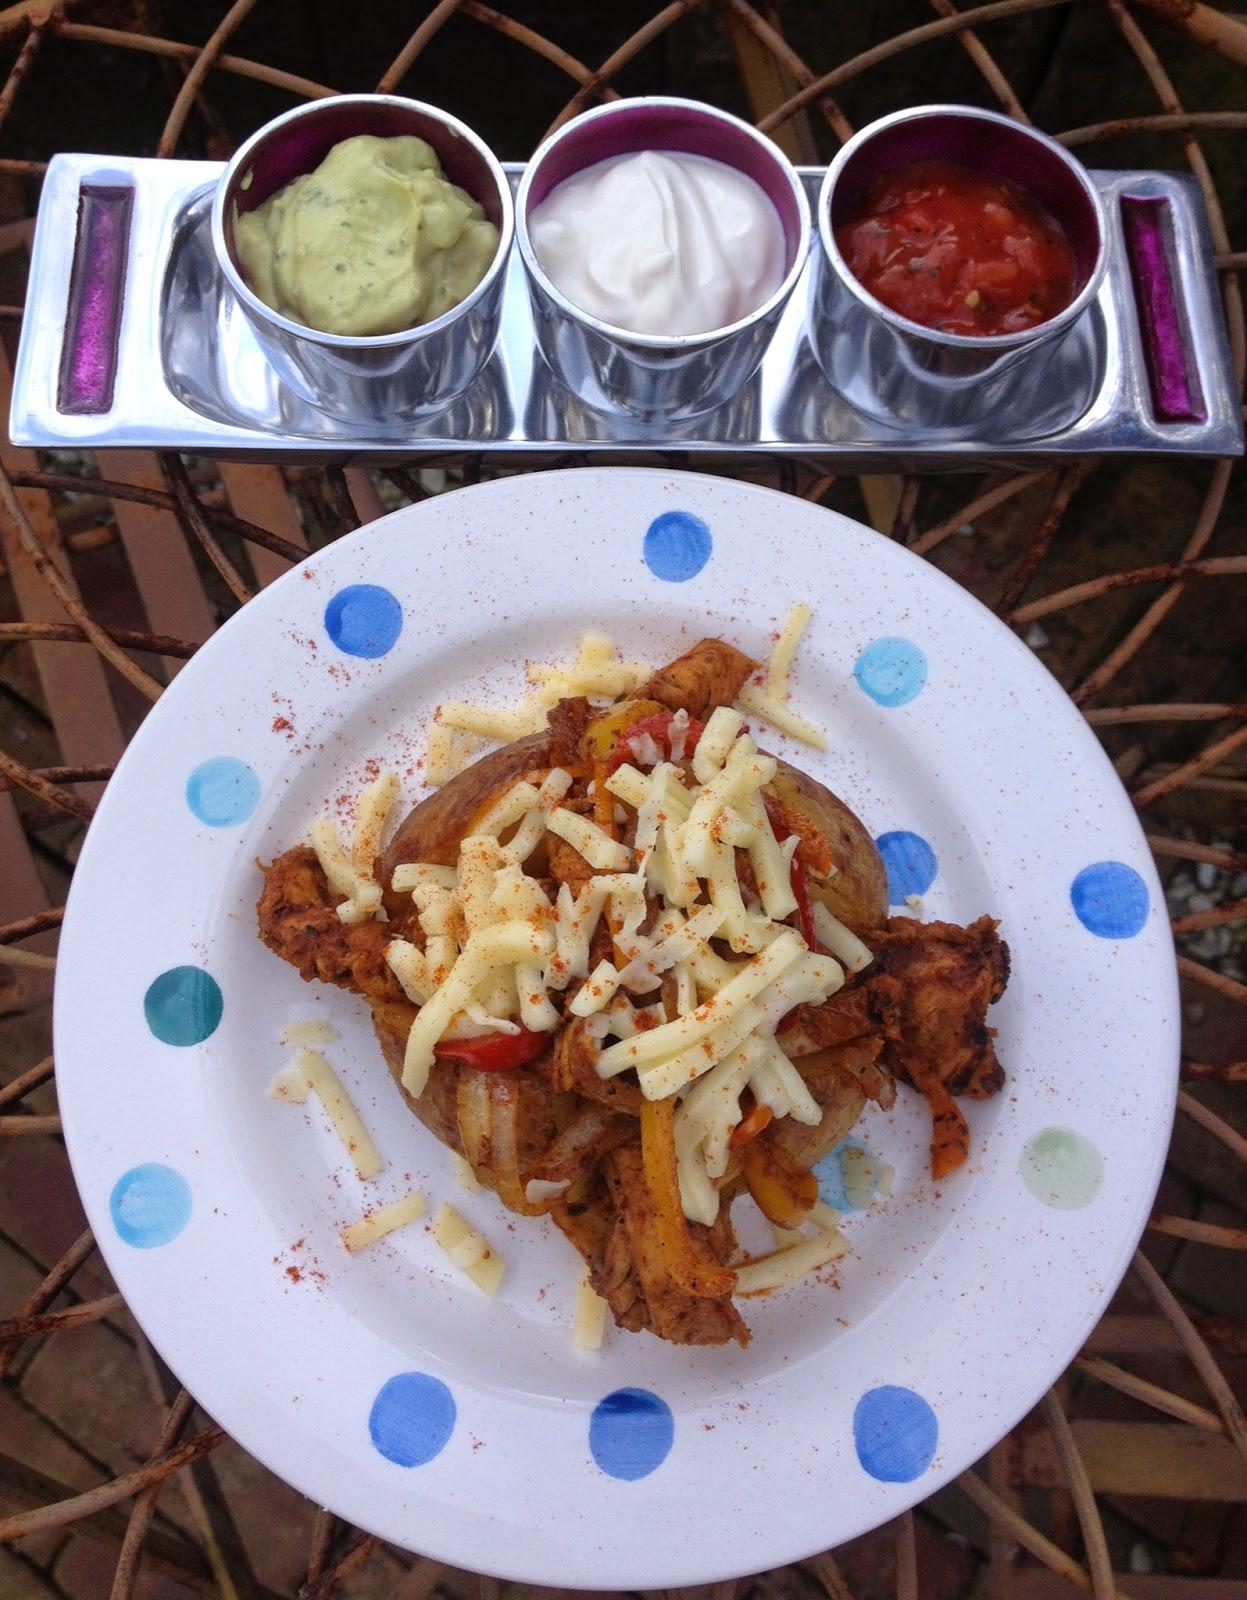 Bannisters' Farm Littl'uns Fajitas Chicken Fajita Baked Jacket Potatoes